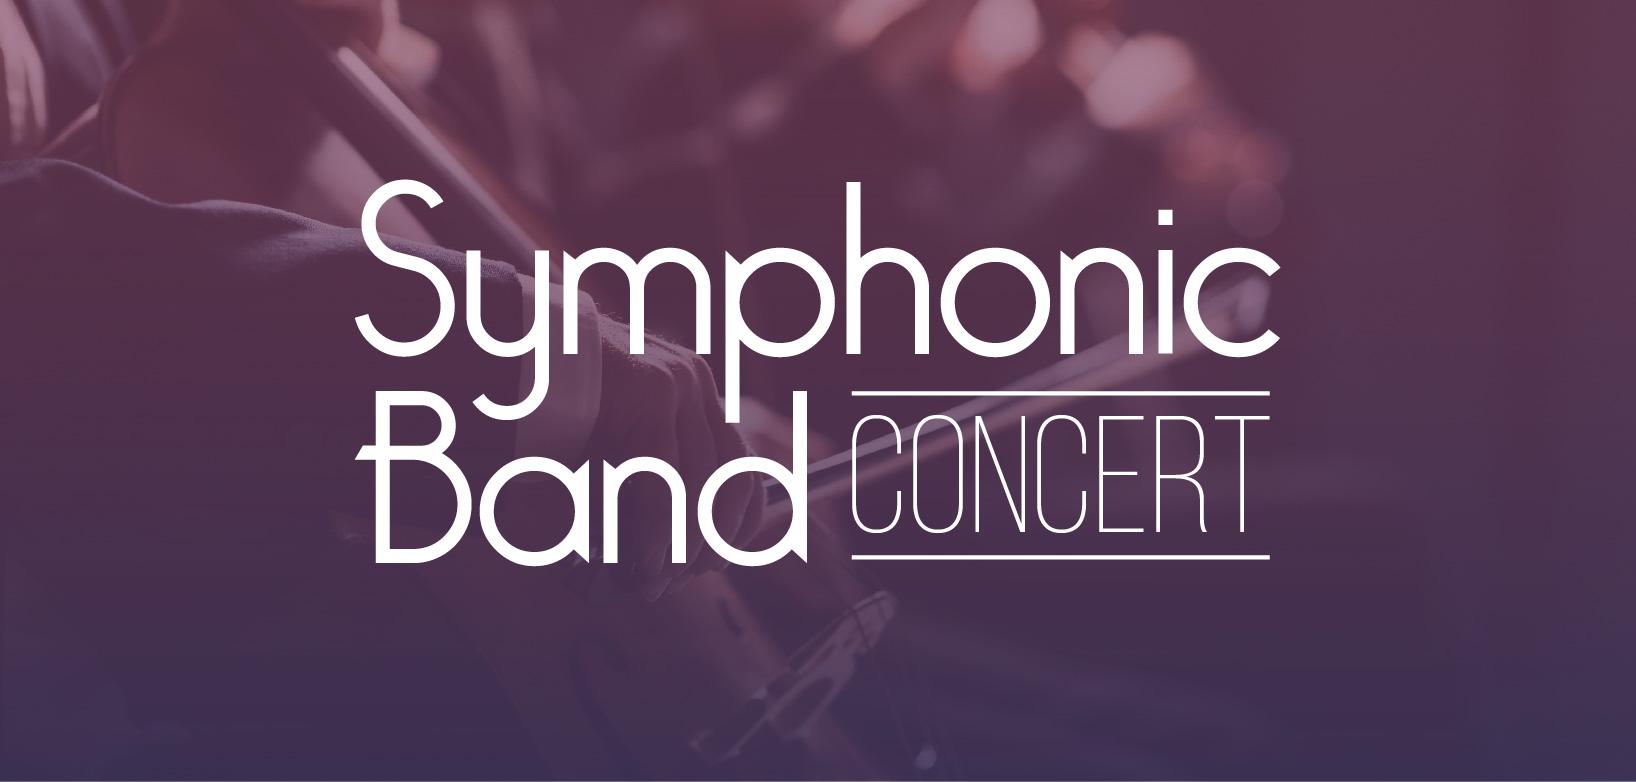 Text reads: Symphonic Band Concert